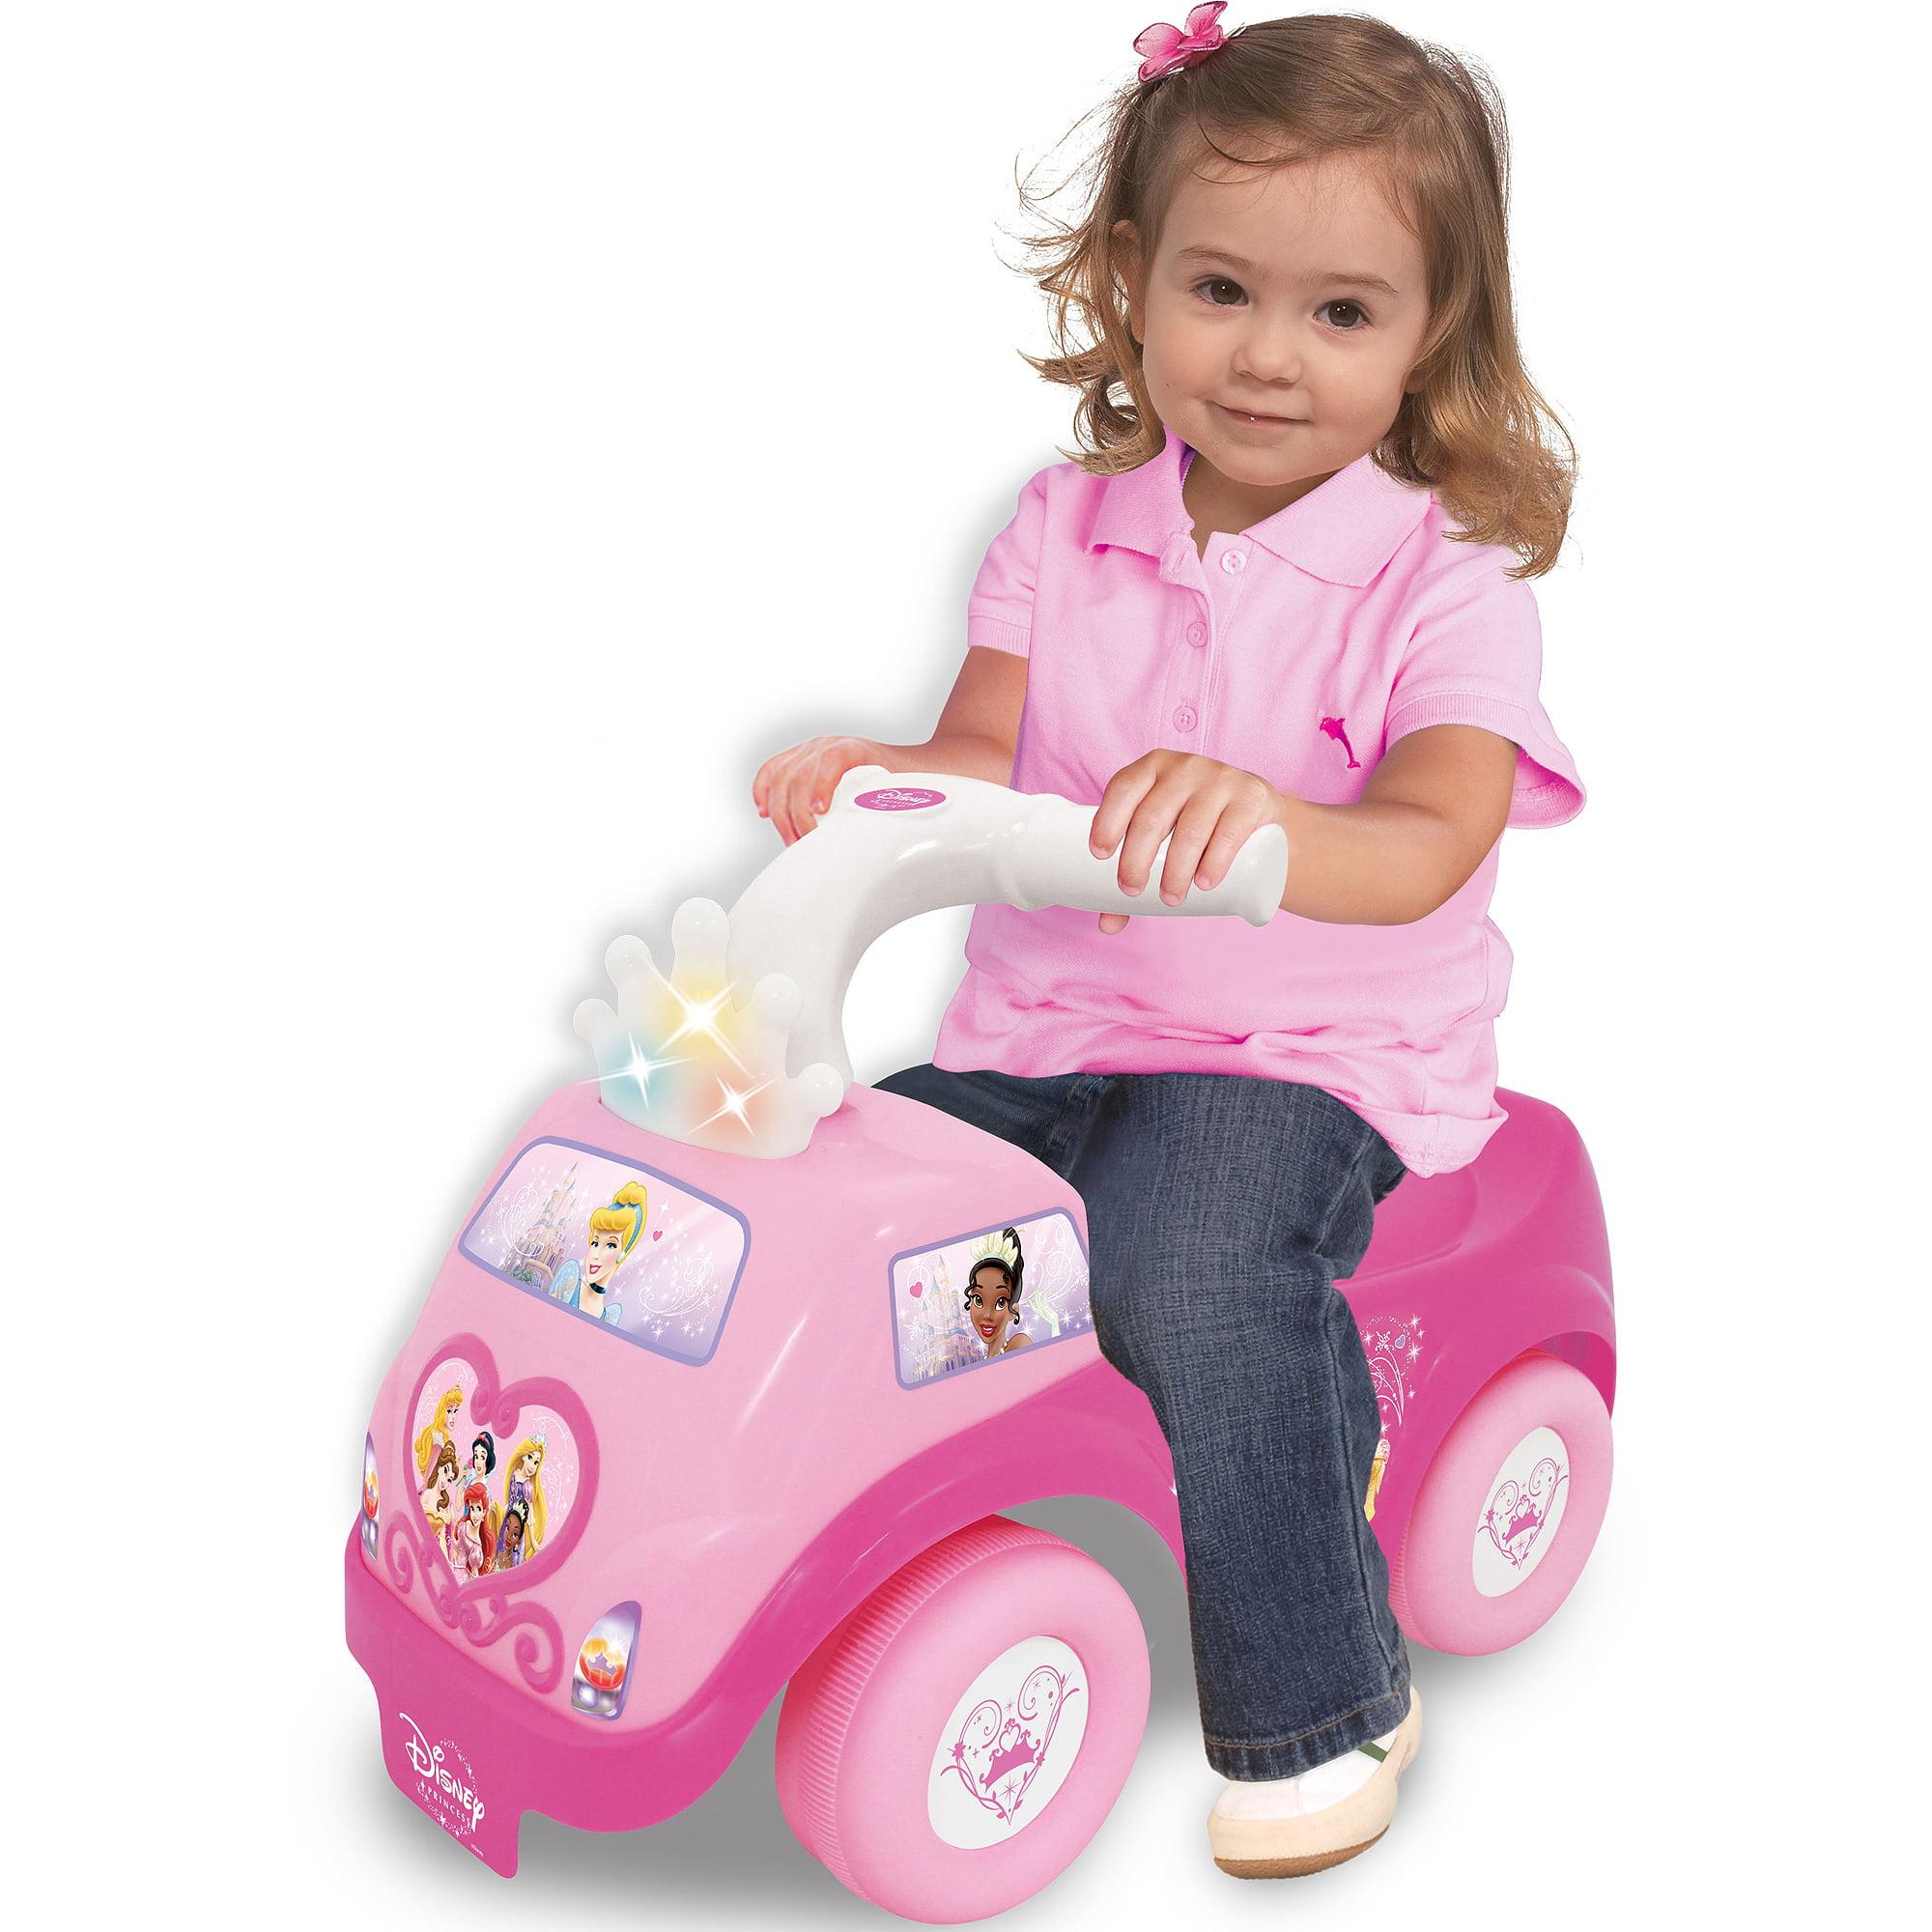 Kiddieland Disney Princess Light 'n Sound Ride-On by Kiddieland